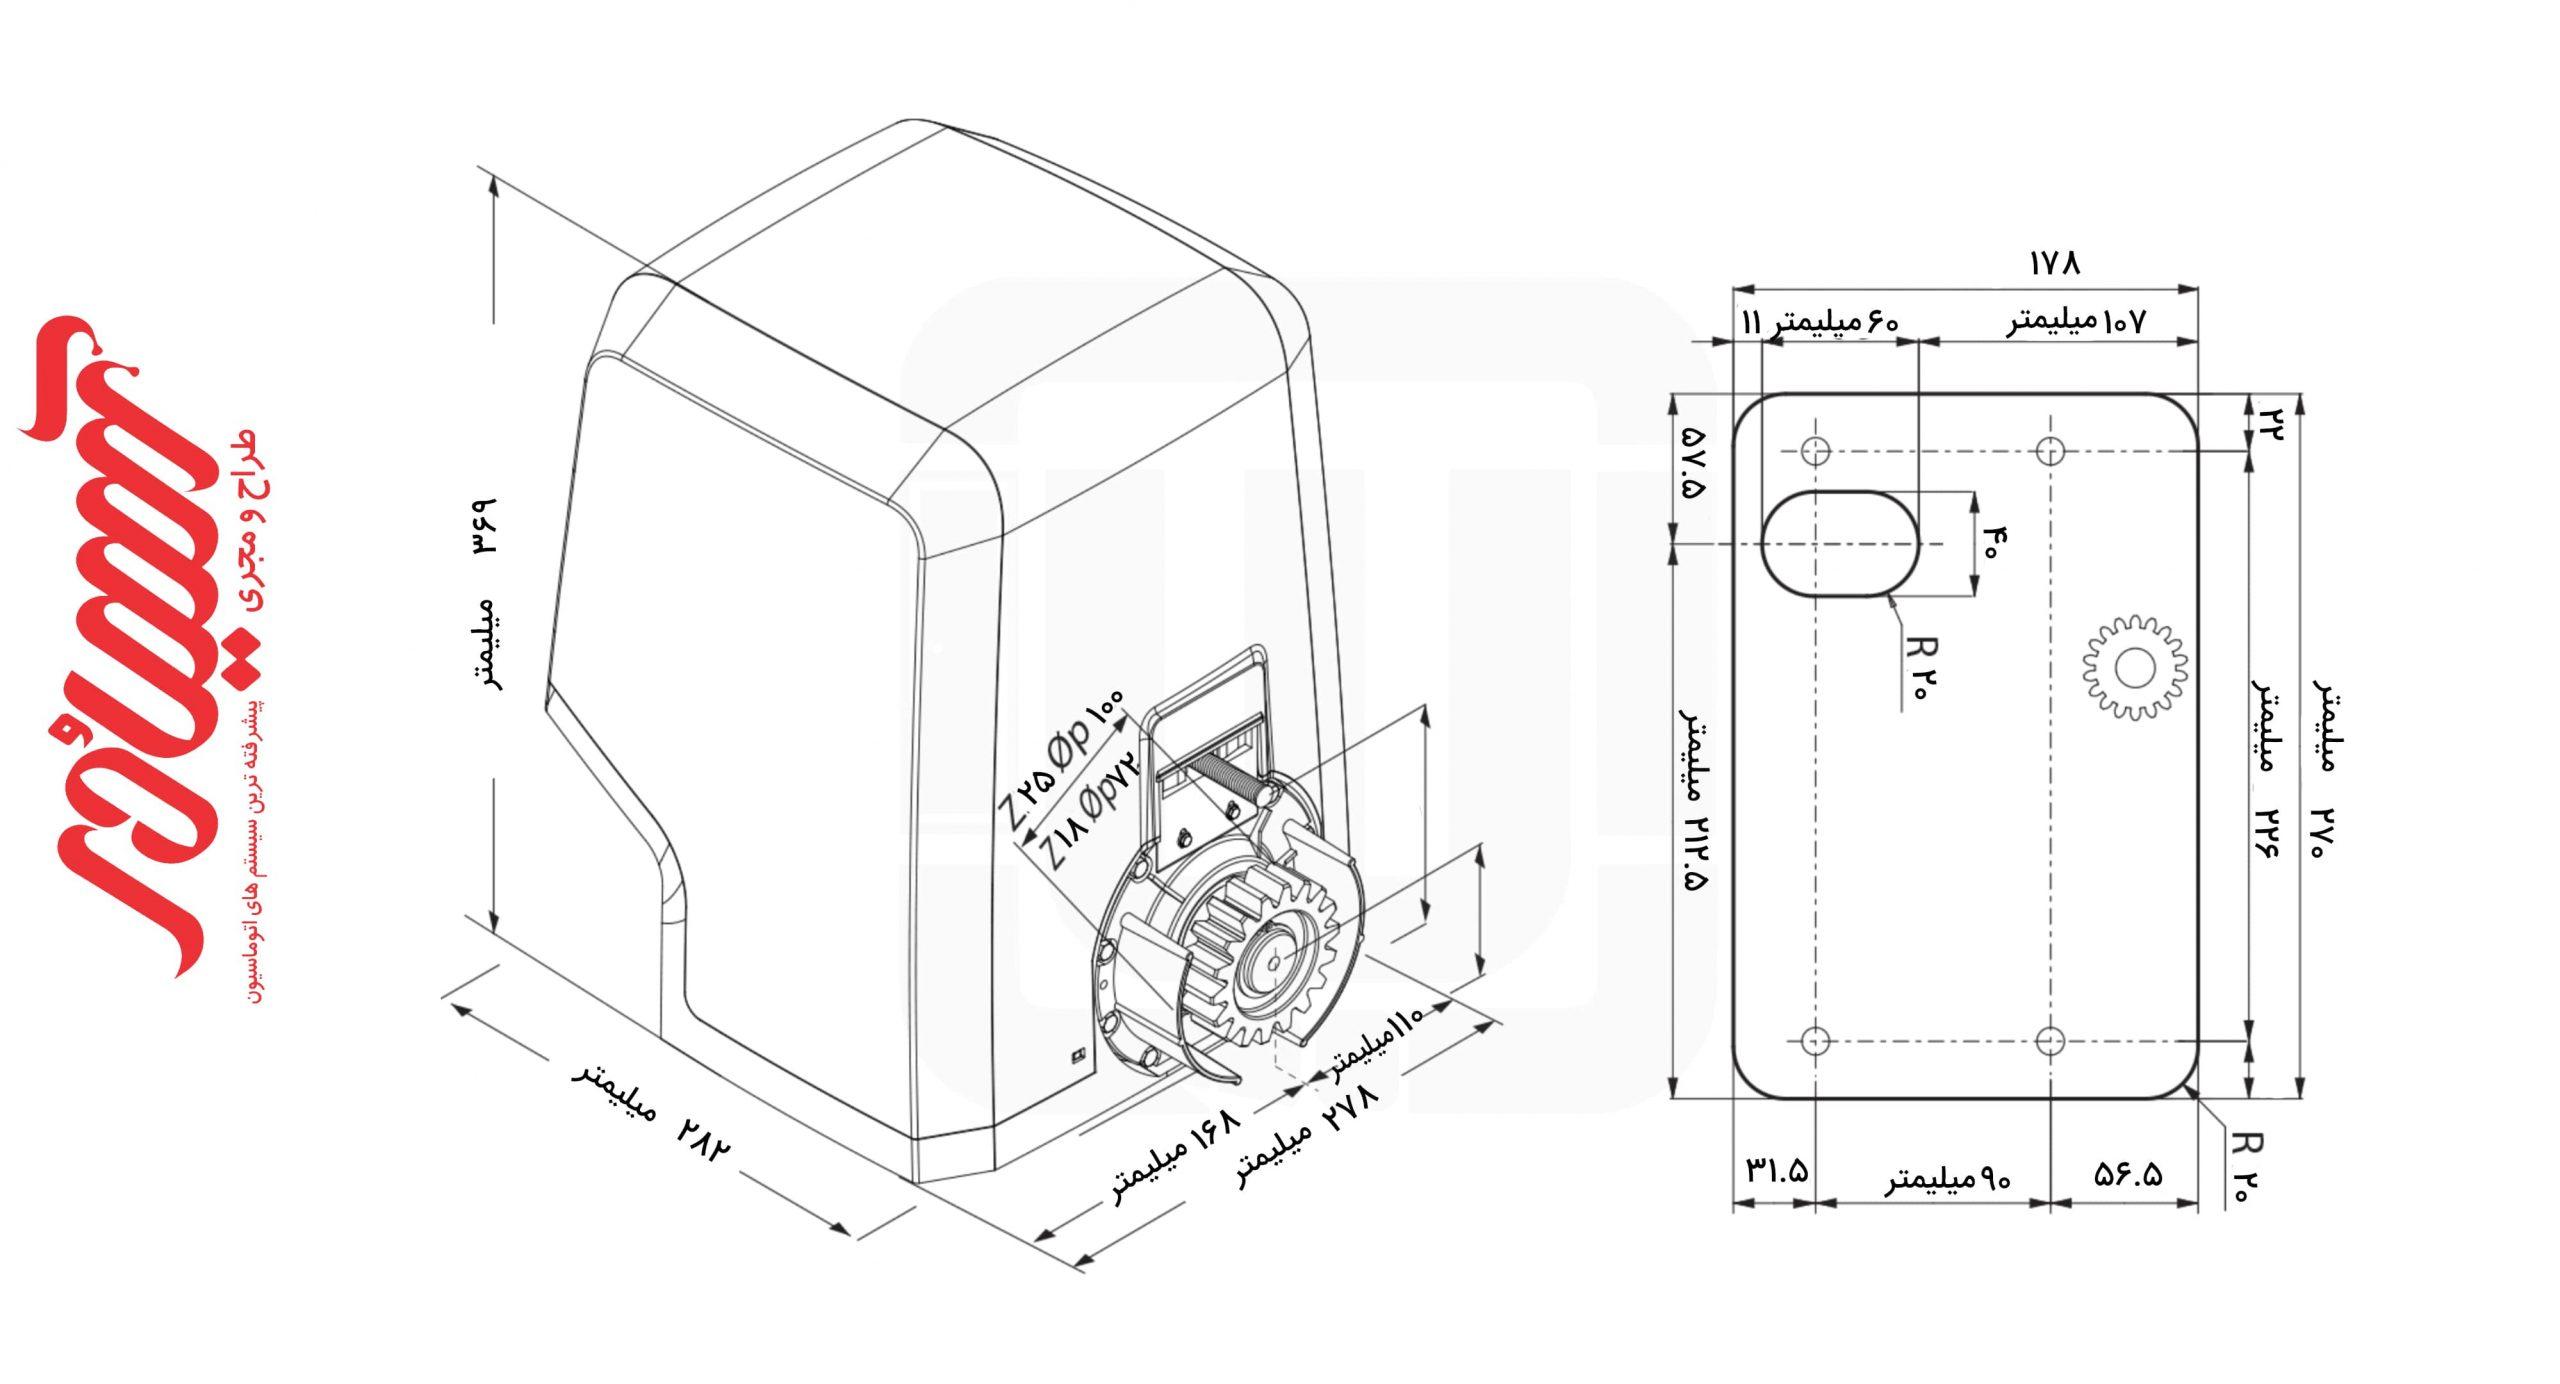 ابعاد جک پارکینگ ریلی BFT ایکارون